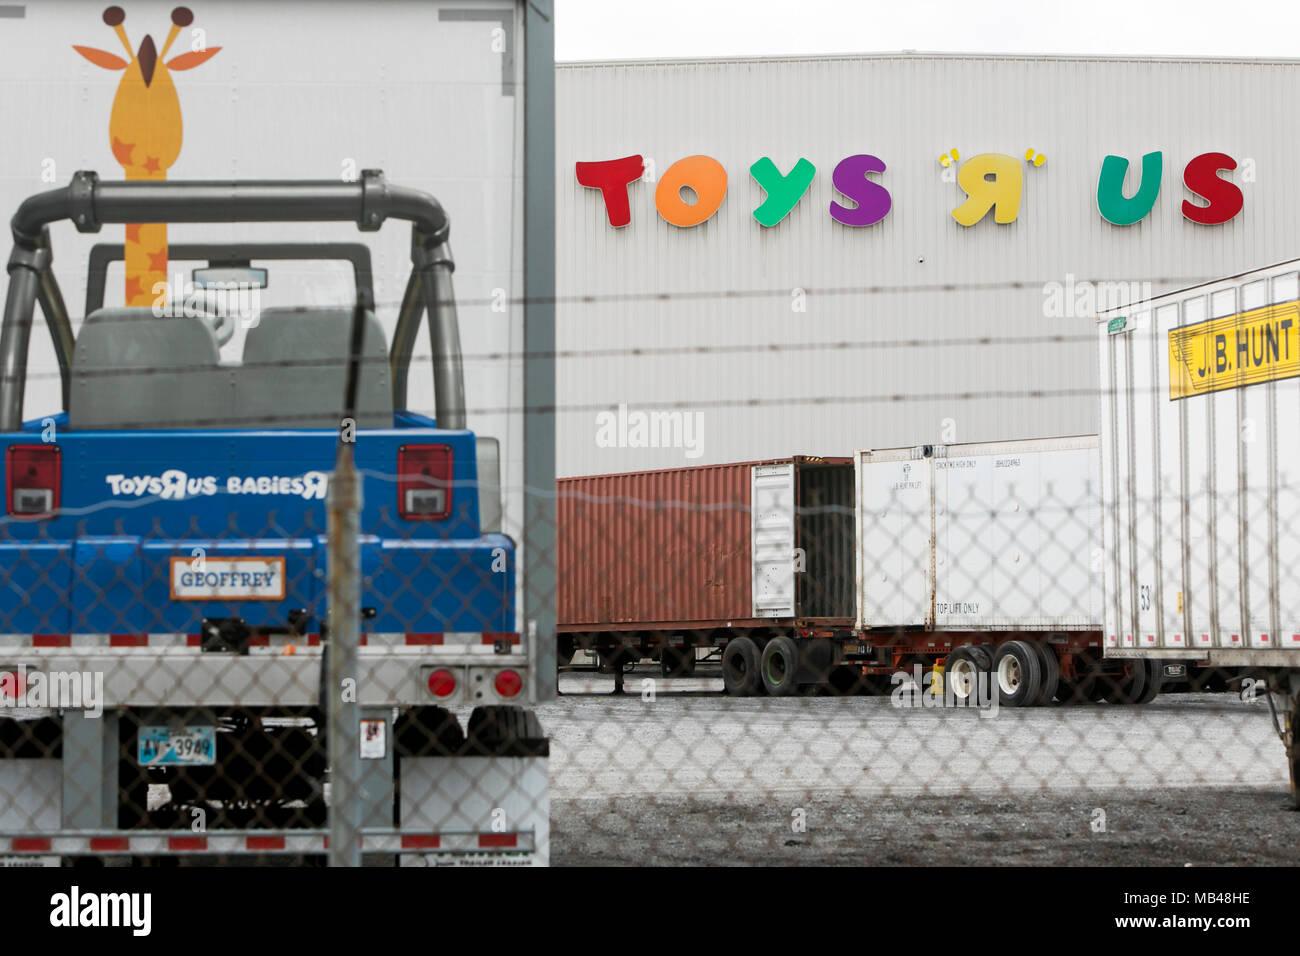 Toys De Stockamp; Store Shopping Center Imágenes In mNO80vnw